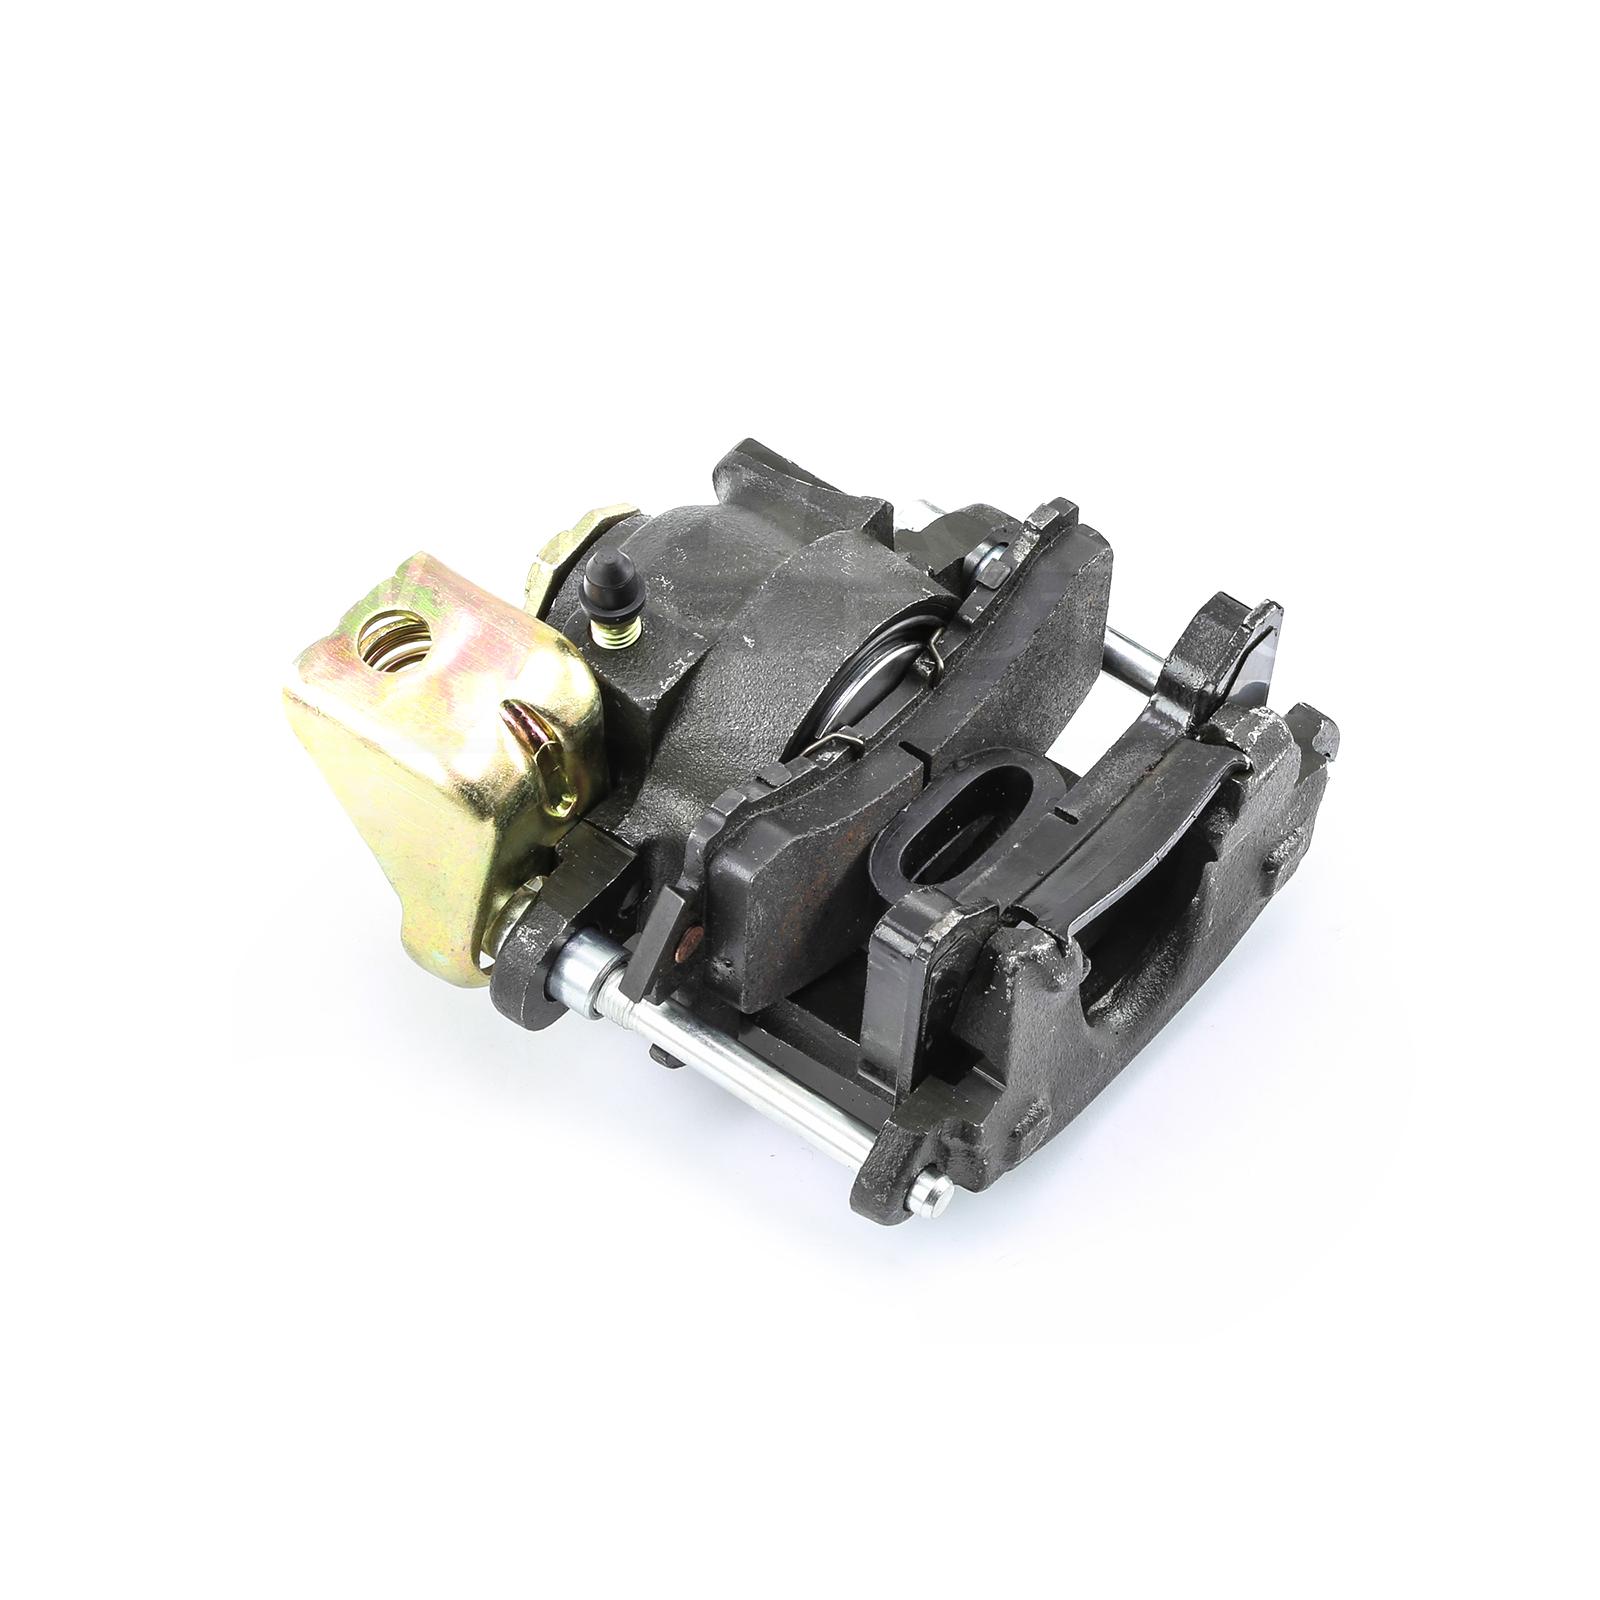 "GM Rear Metric Caliper w/Emergency Brake 5"" Pin LH Side 7/16"" Inlet"